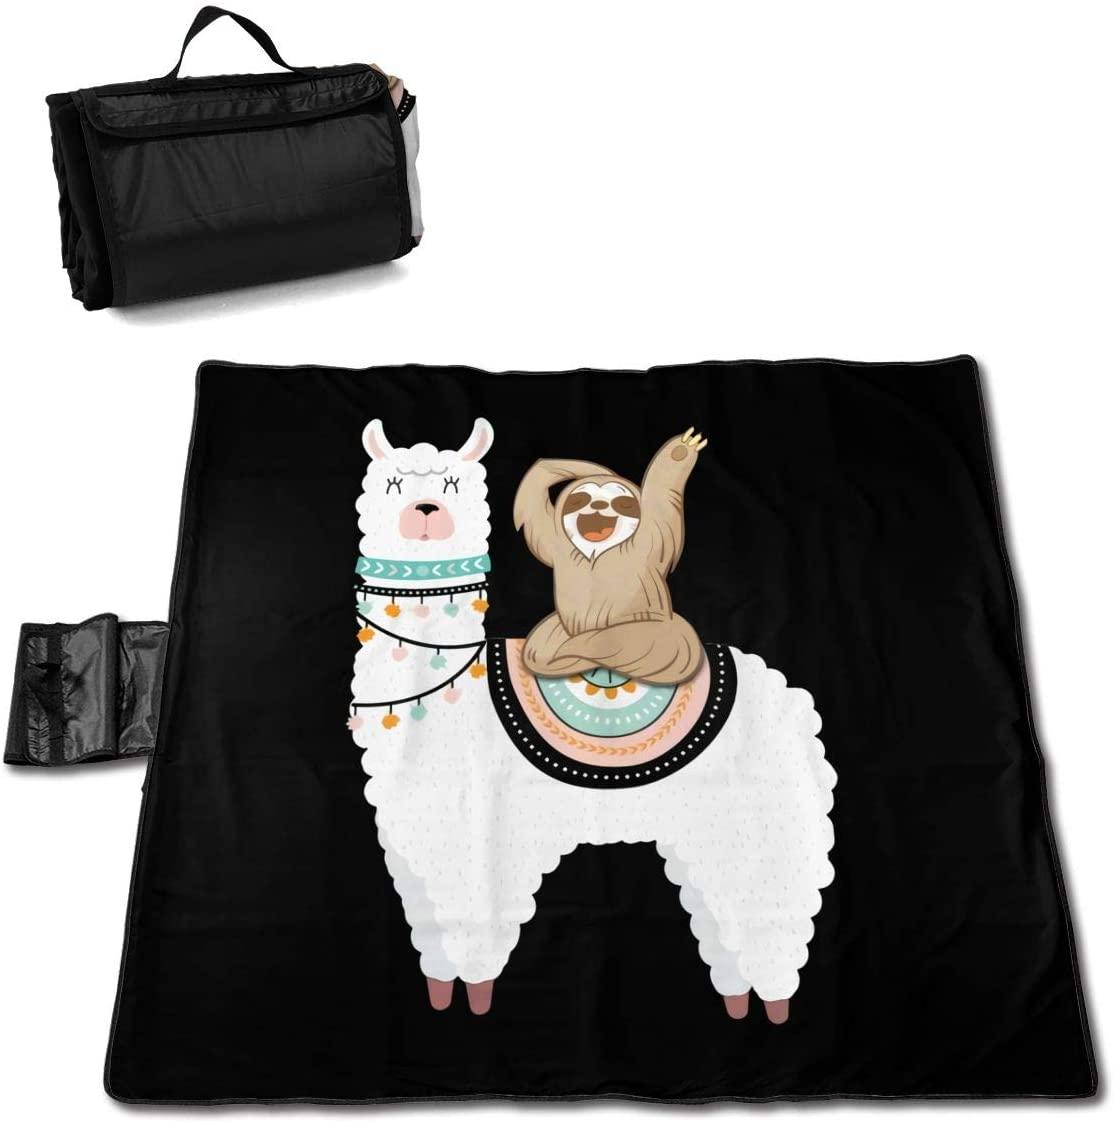 Kelo Sloth Riding Llama Portable Printed Picnic Blanket Waterproof 59x57(in)